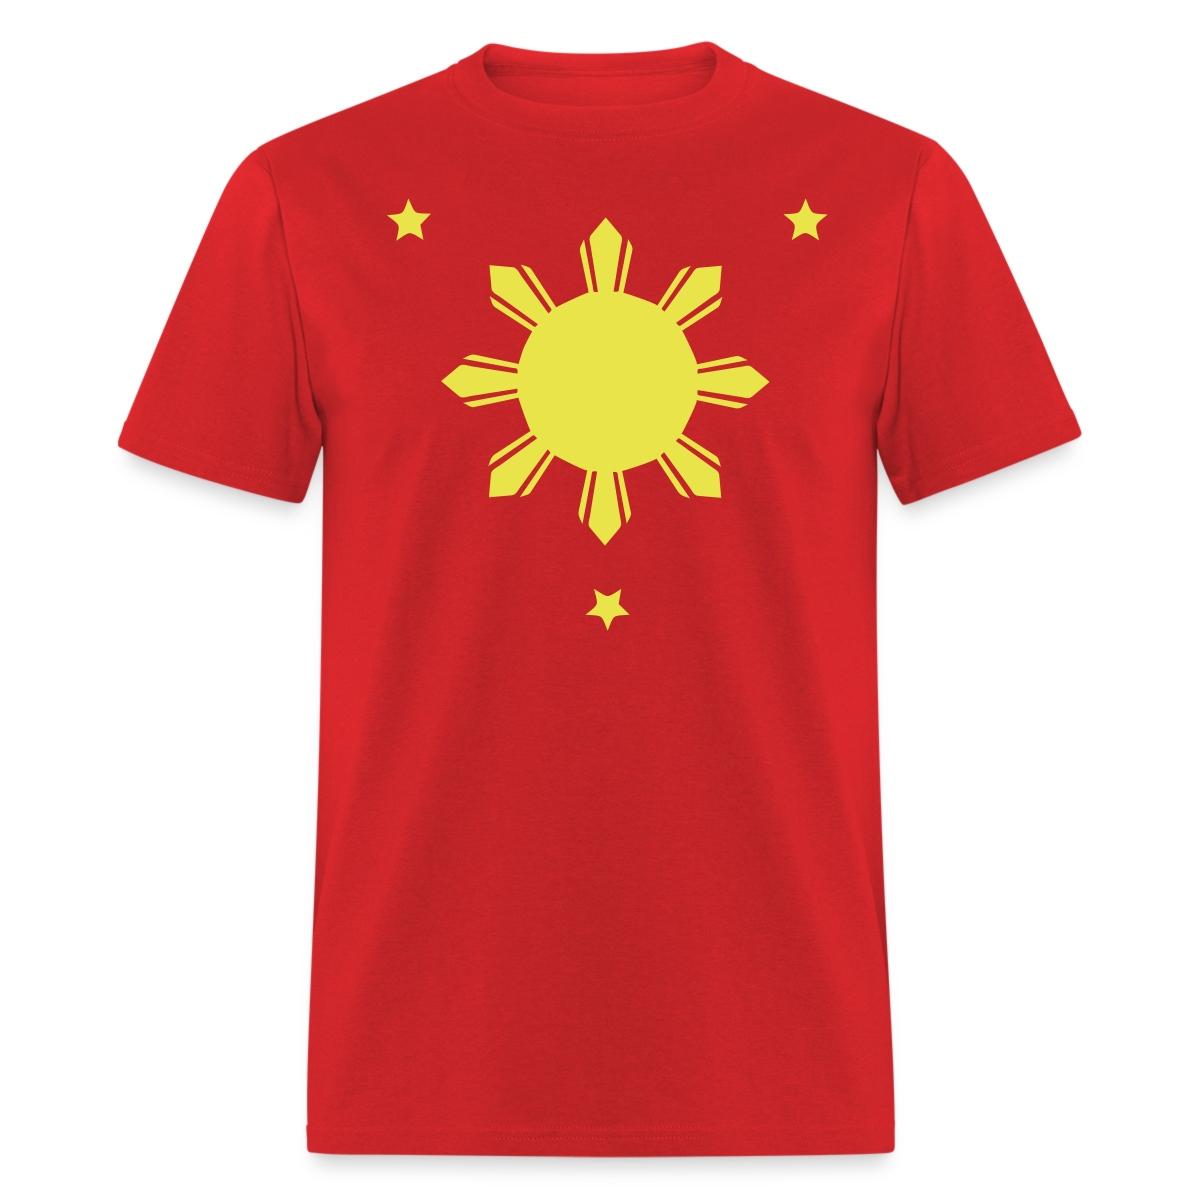 Philippines sun stars men 39 s t shirt ebay for Mens shirt with stars